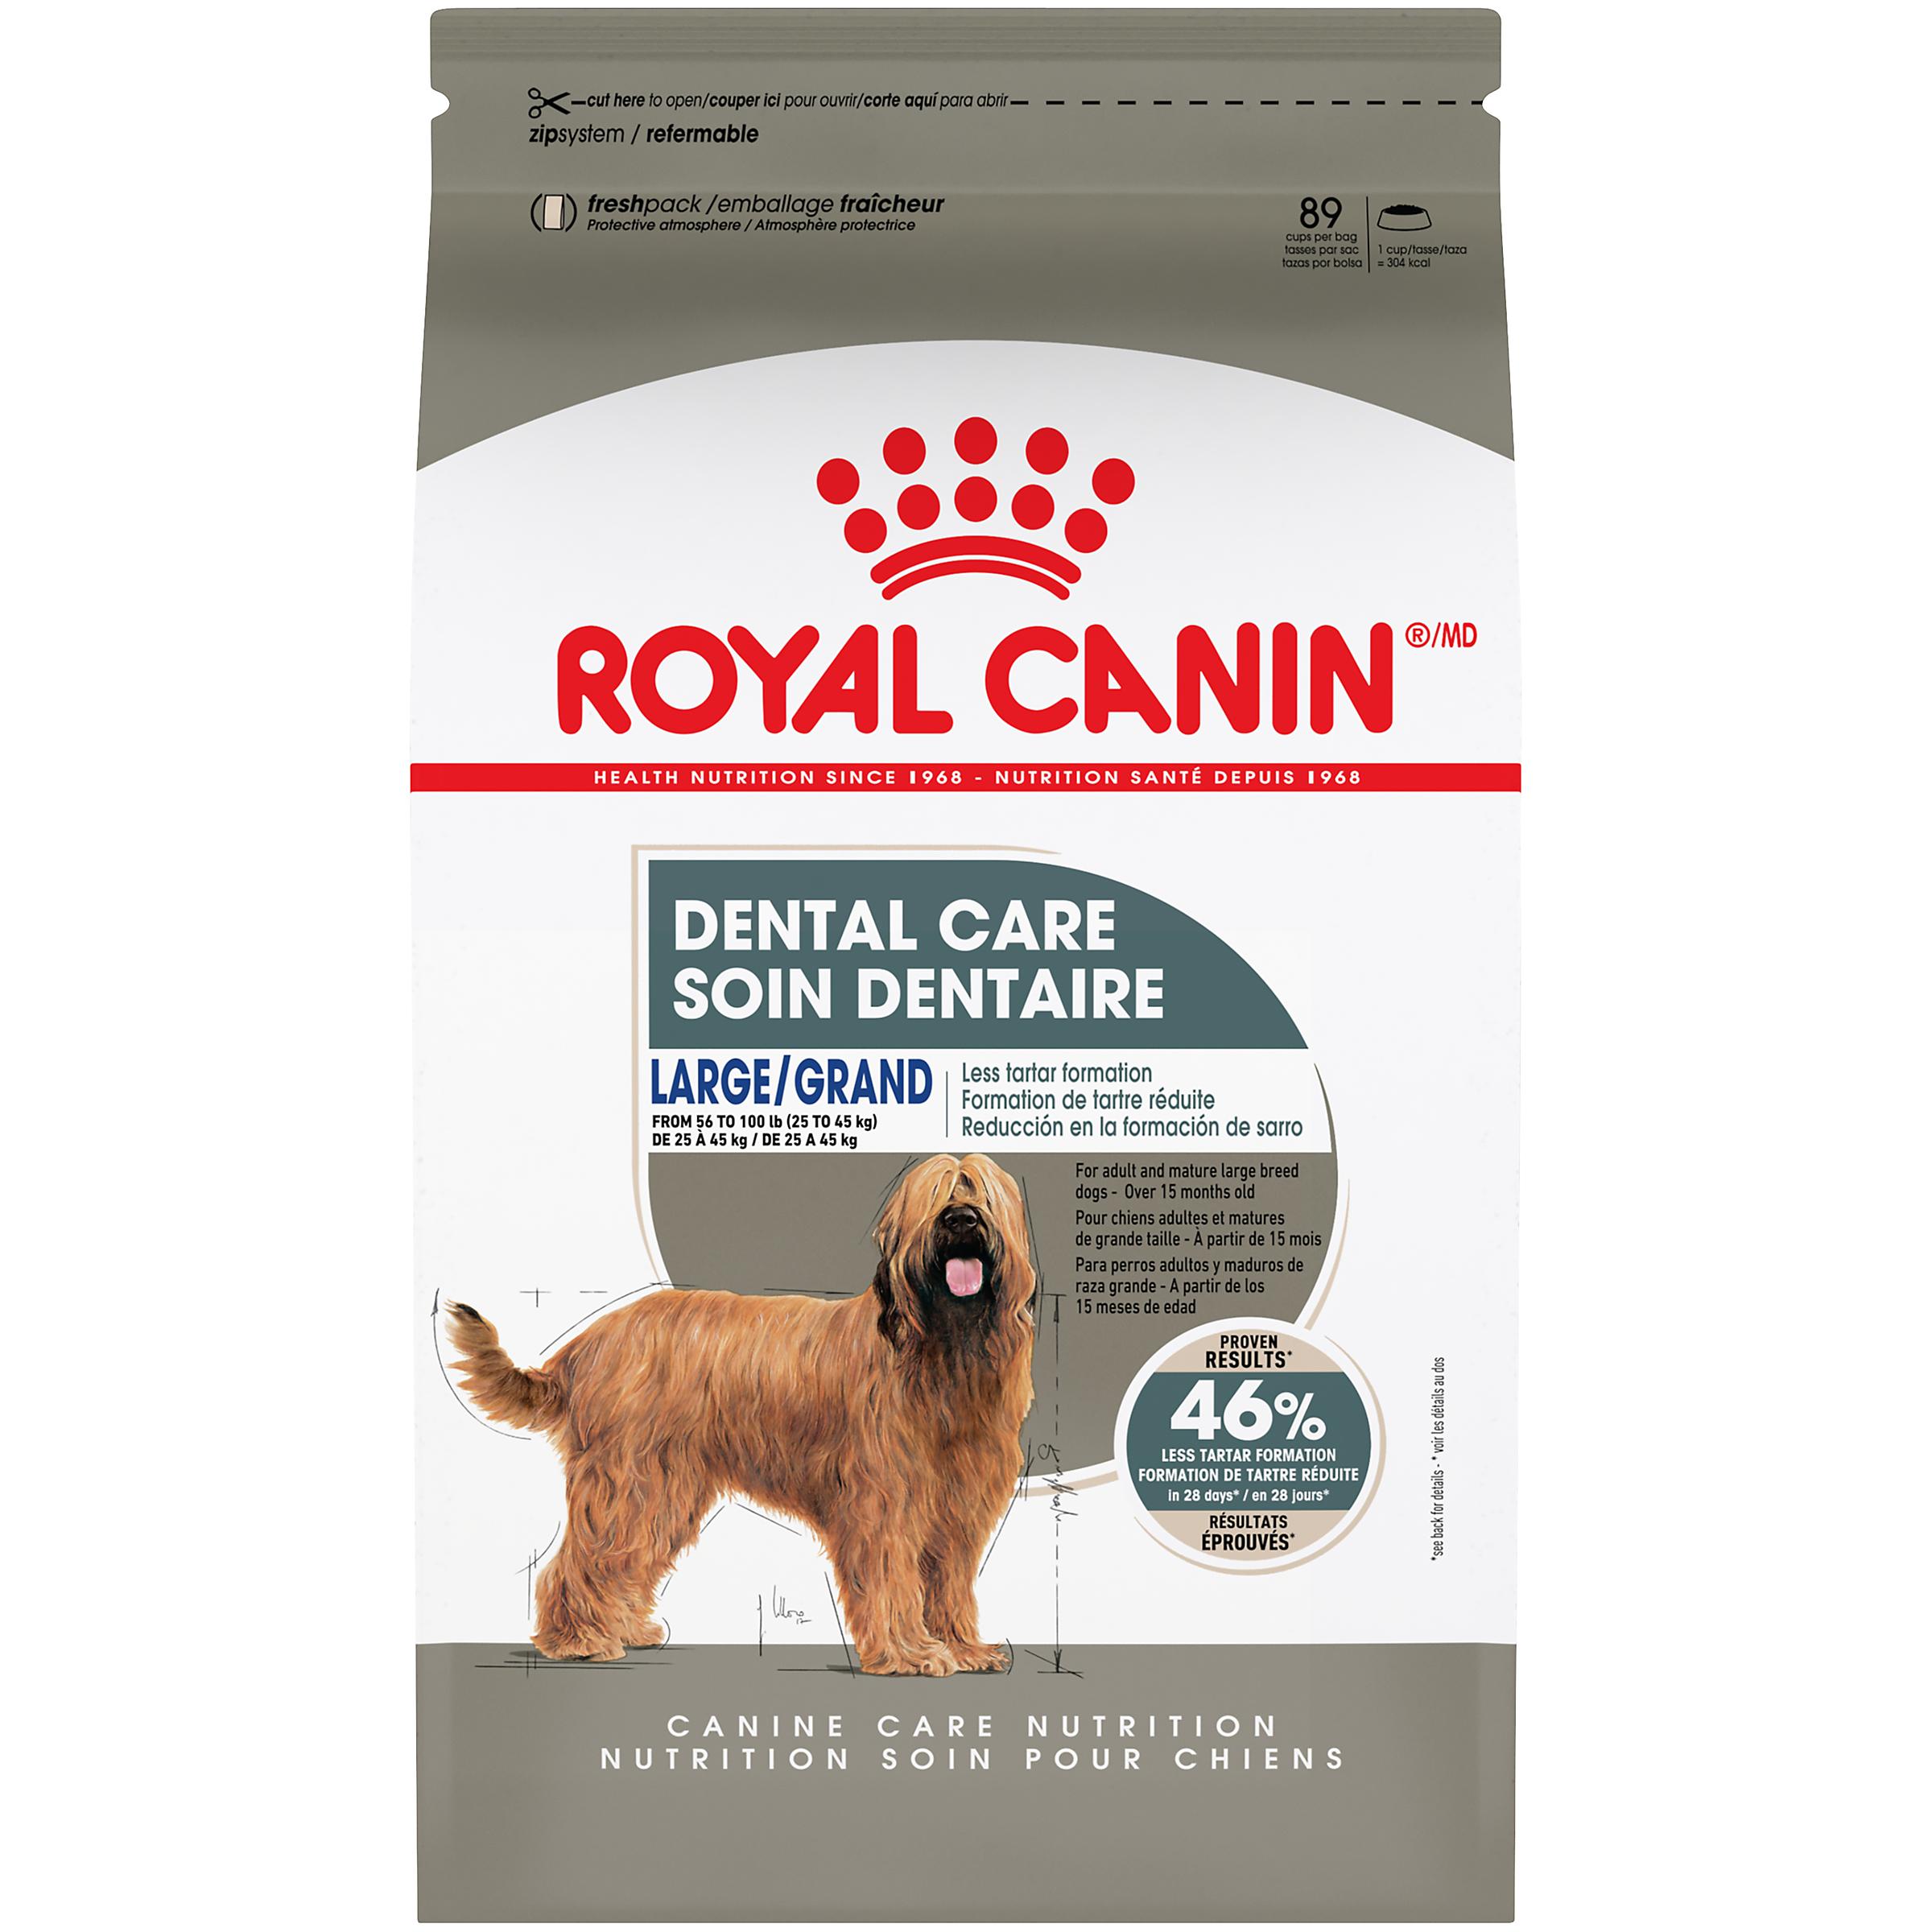 Royal Canin Canine Care Nutrition Large Dental Care Dry Dog Food Image